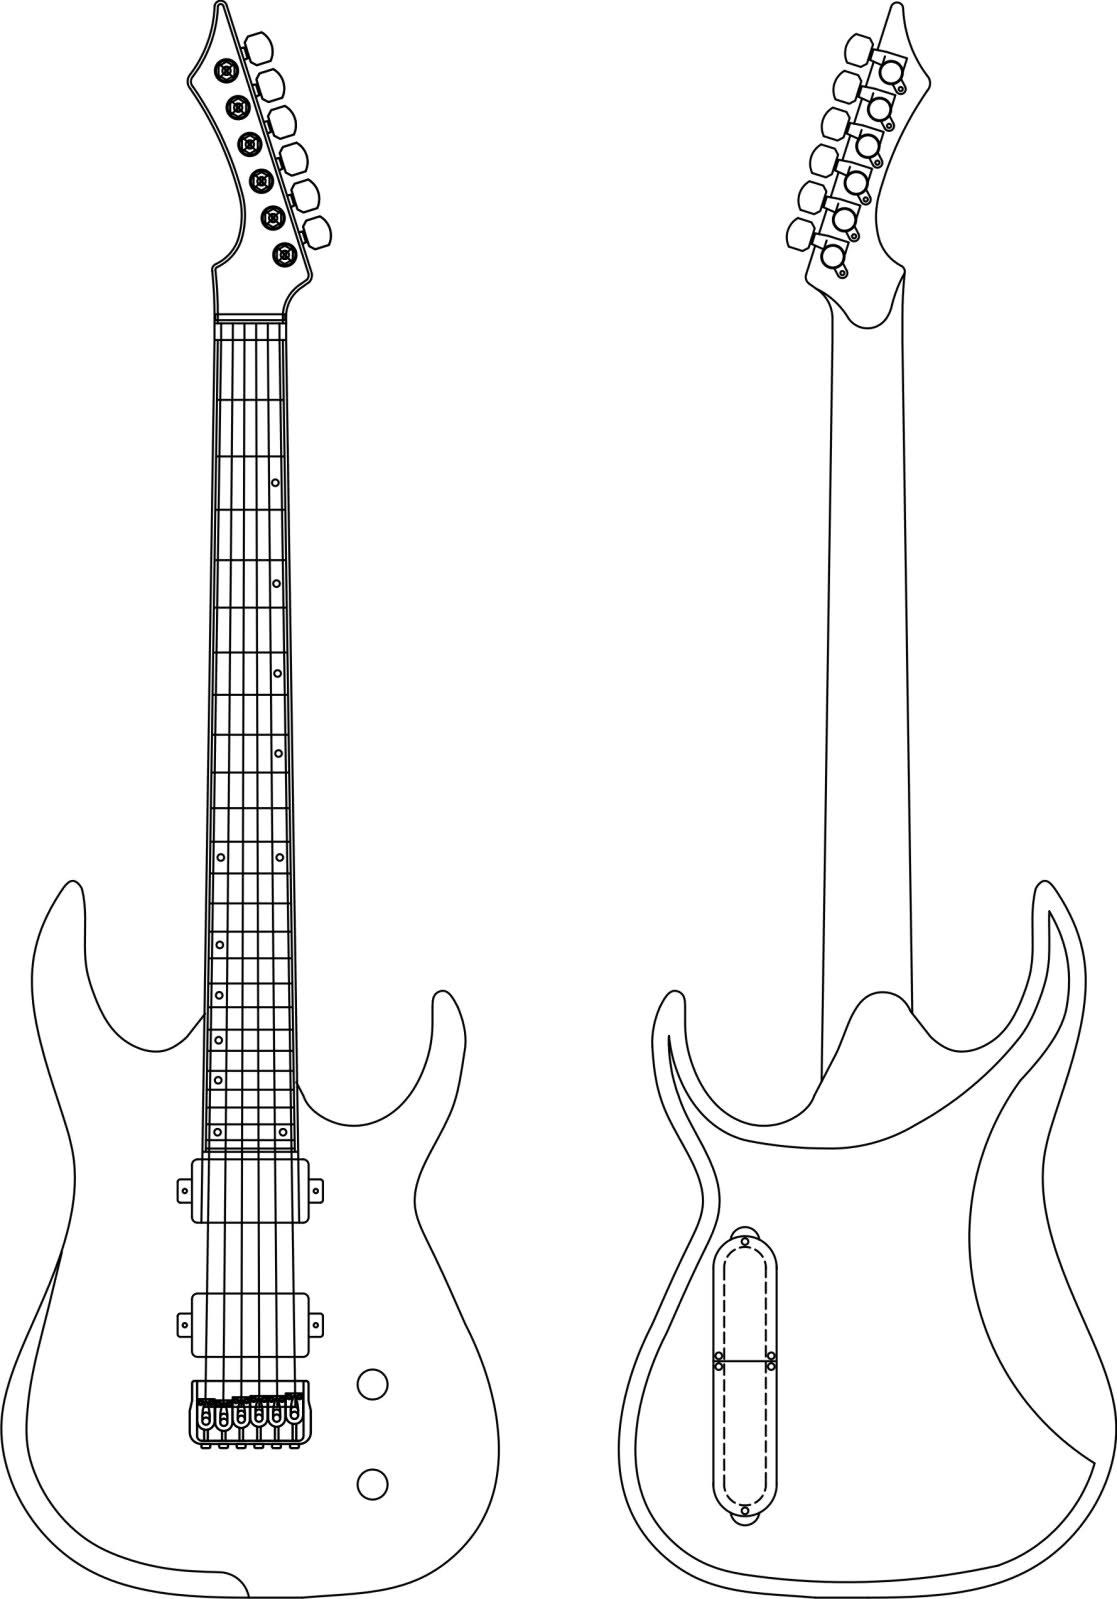 Dovetail template printable guitar - Http I55 Tinypic Com 2pocsvd Jpg